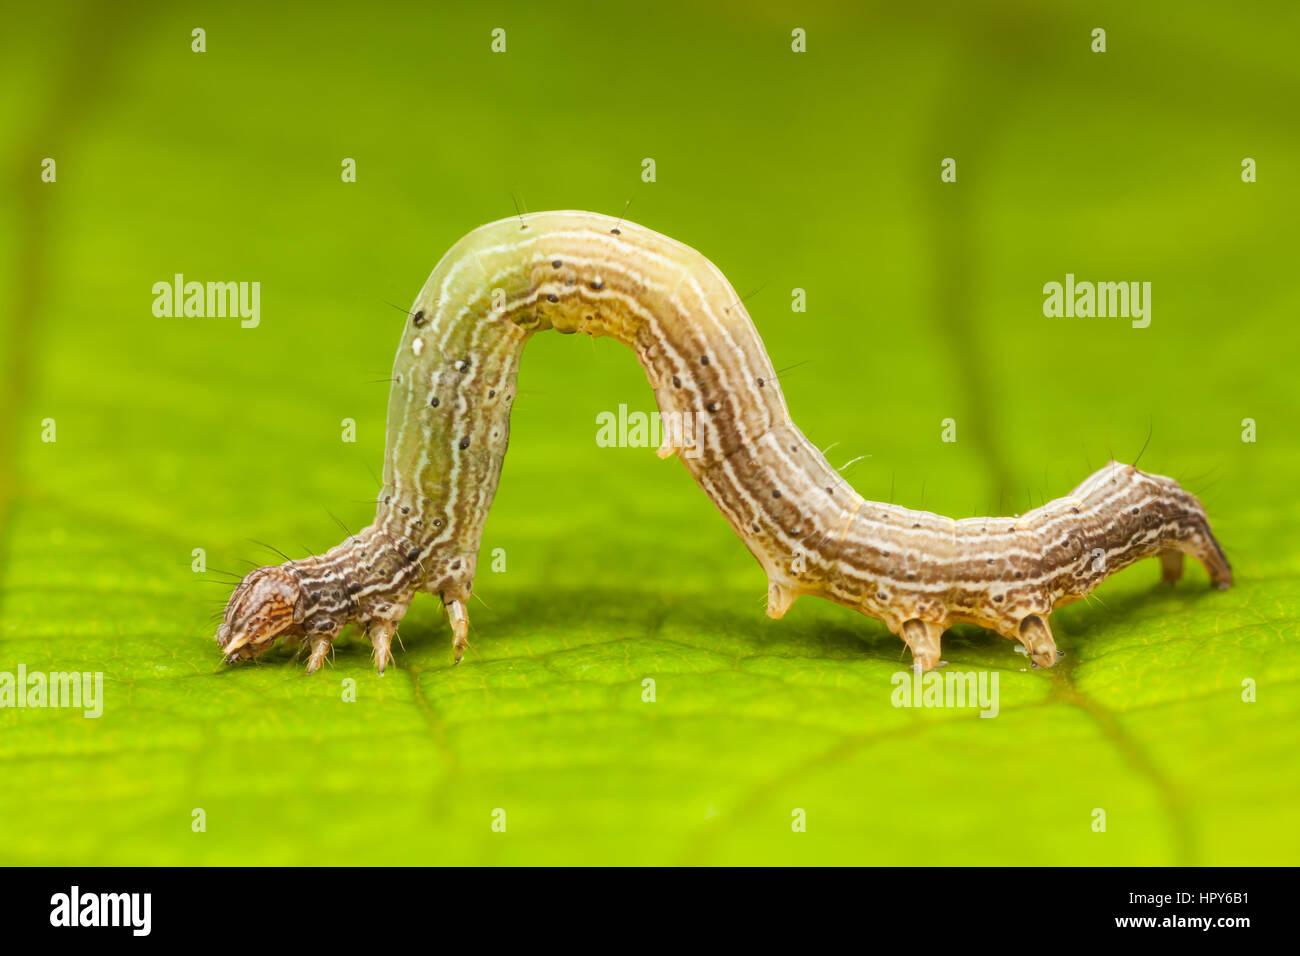 Erebid Moth (Zale sp.) caterpillar (larva) displaying movement like a geometer caterpillar. - Stock Image